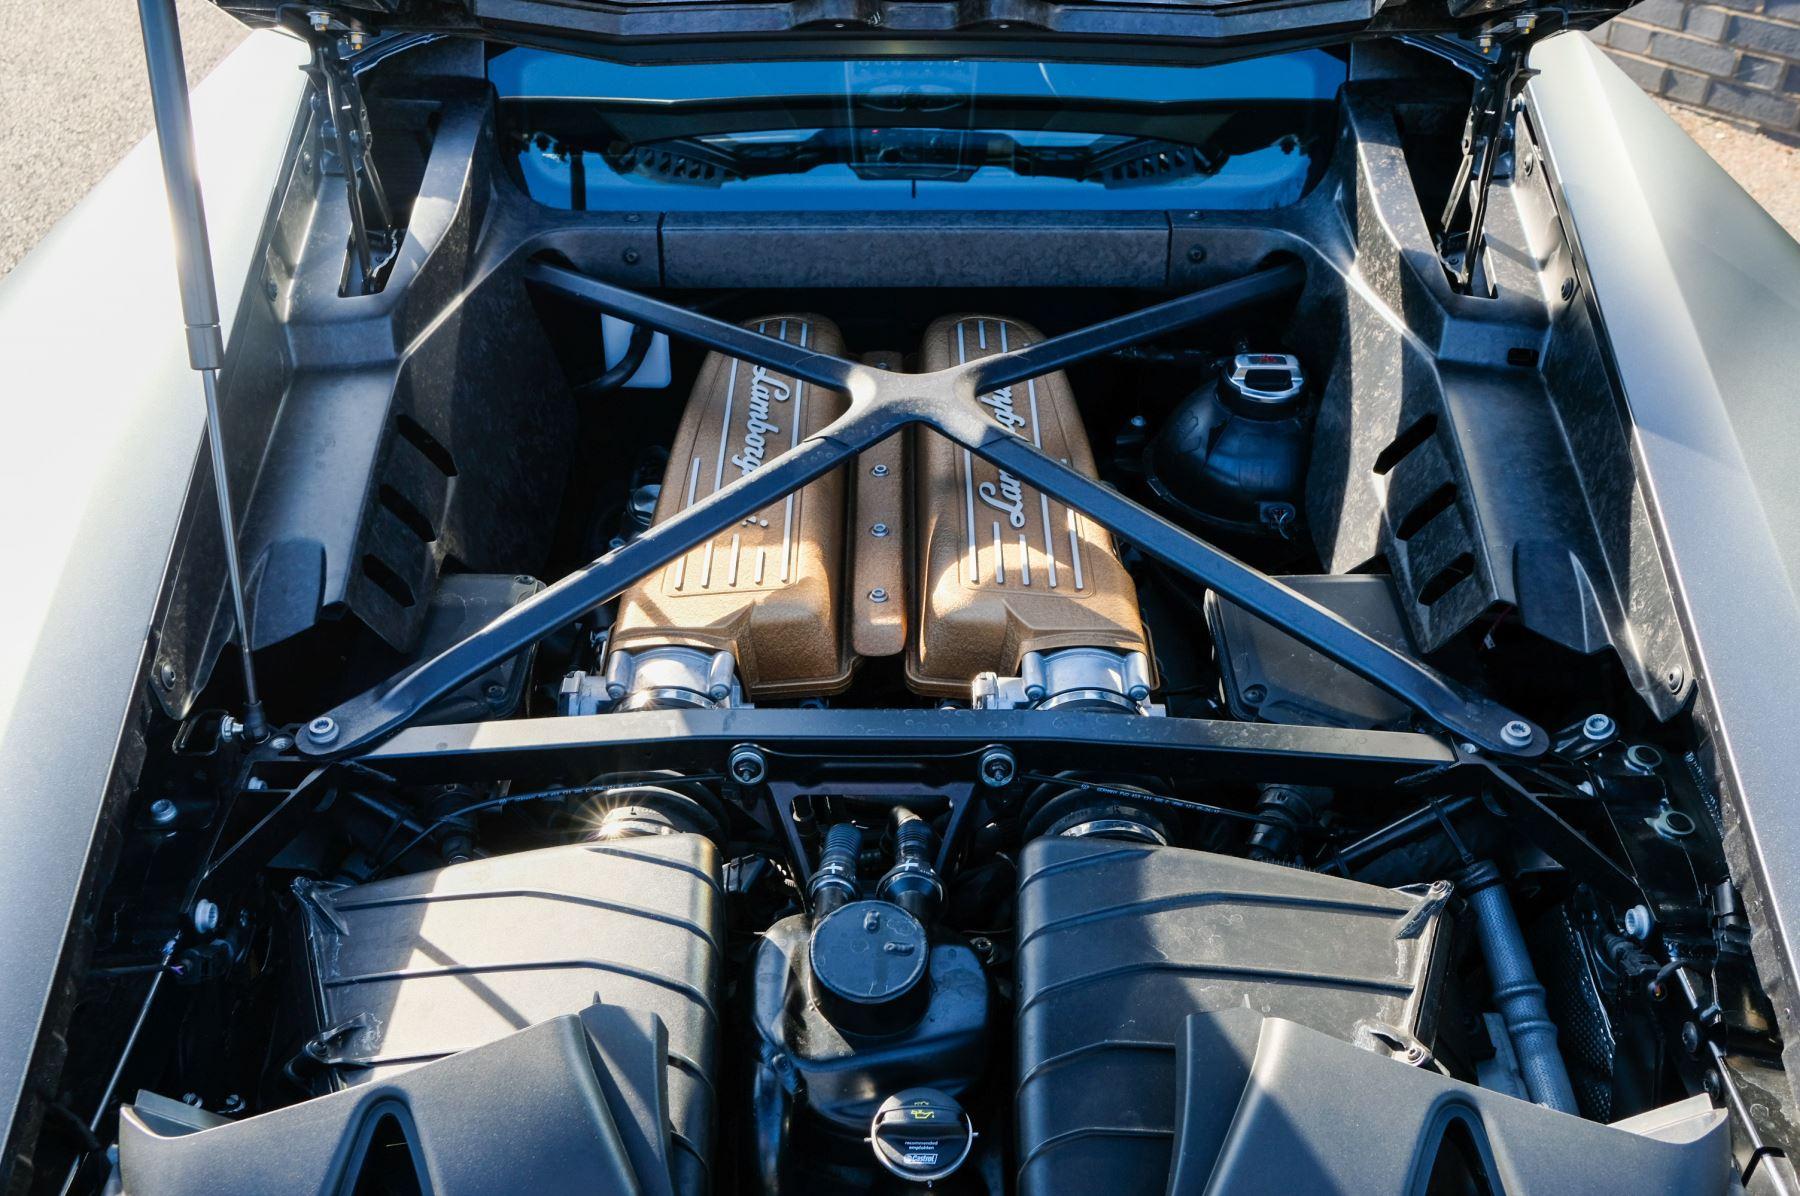 Lamborghini Huracan Performante LP 640-4 2dr LDF - Carbon Ceramic Brakes - Carbon Fiber Features - Comfort Seats image 8